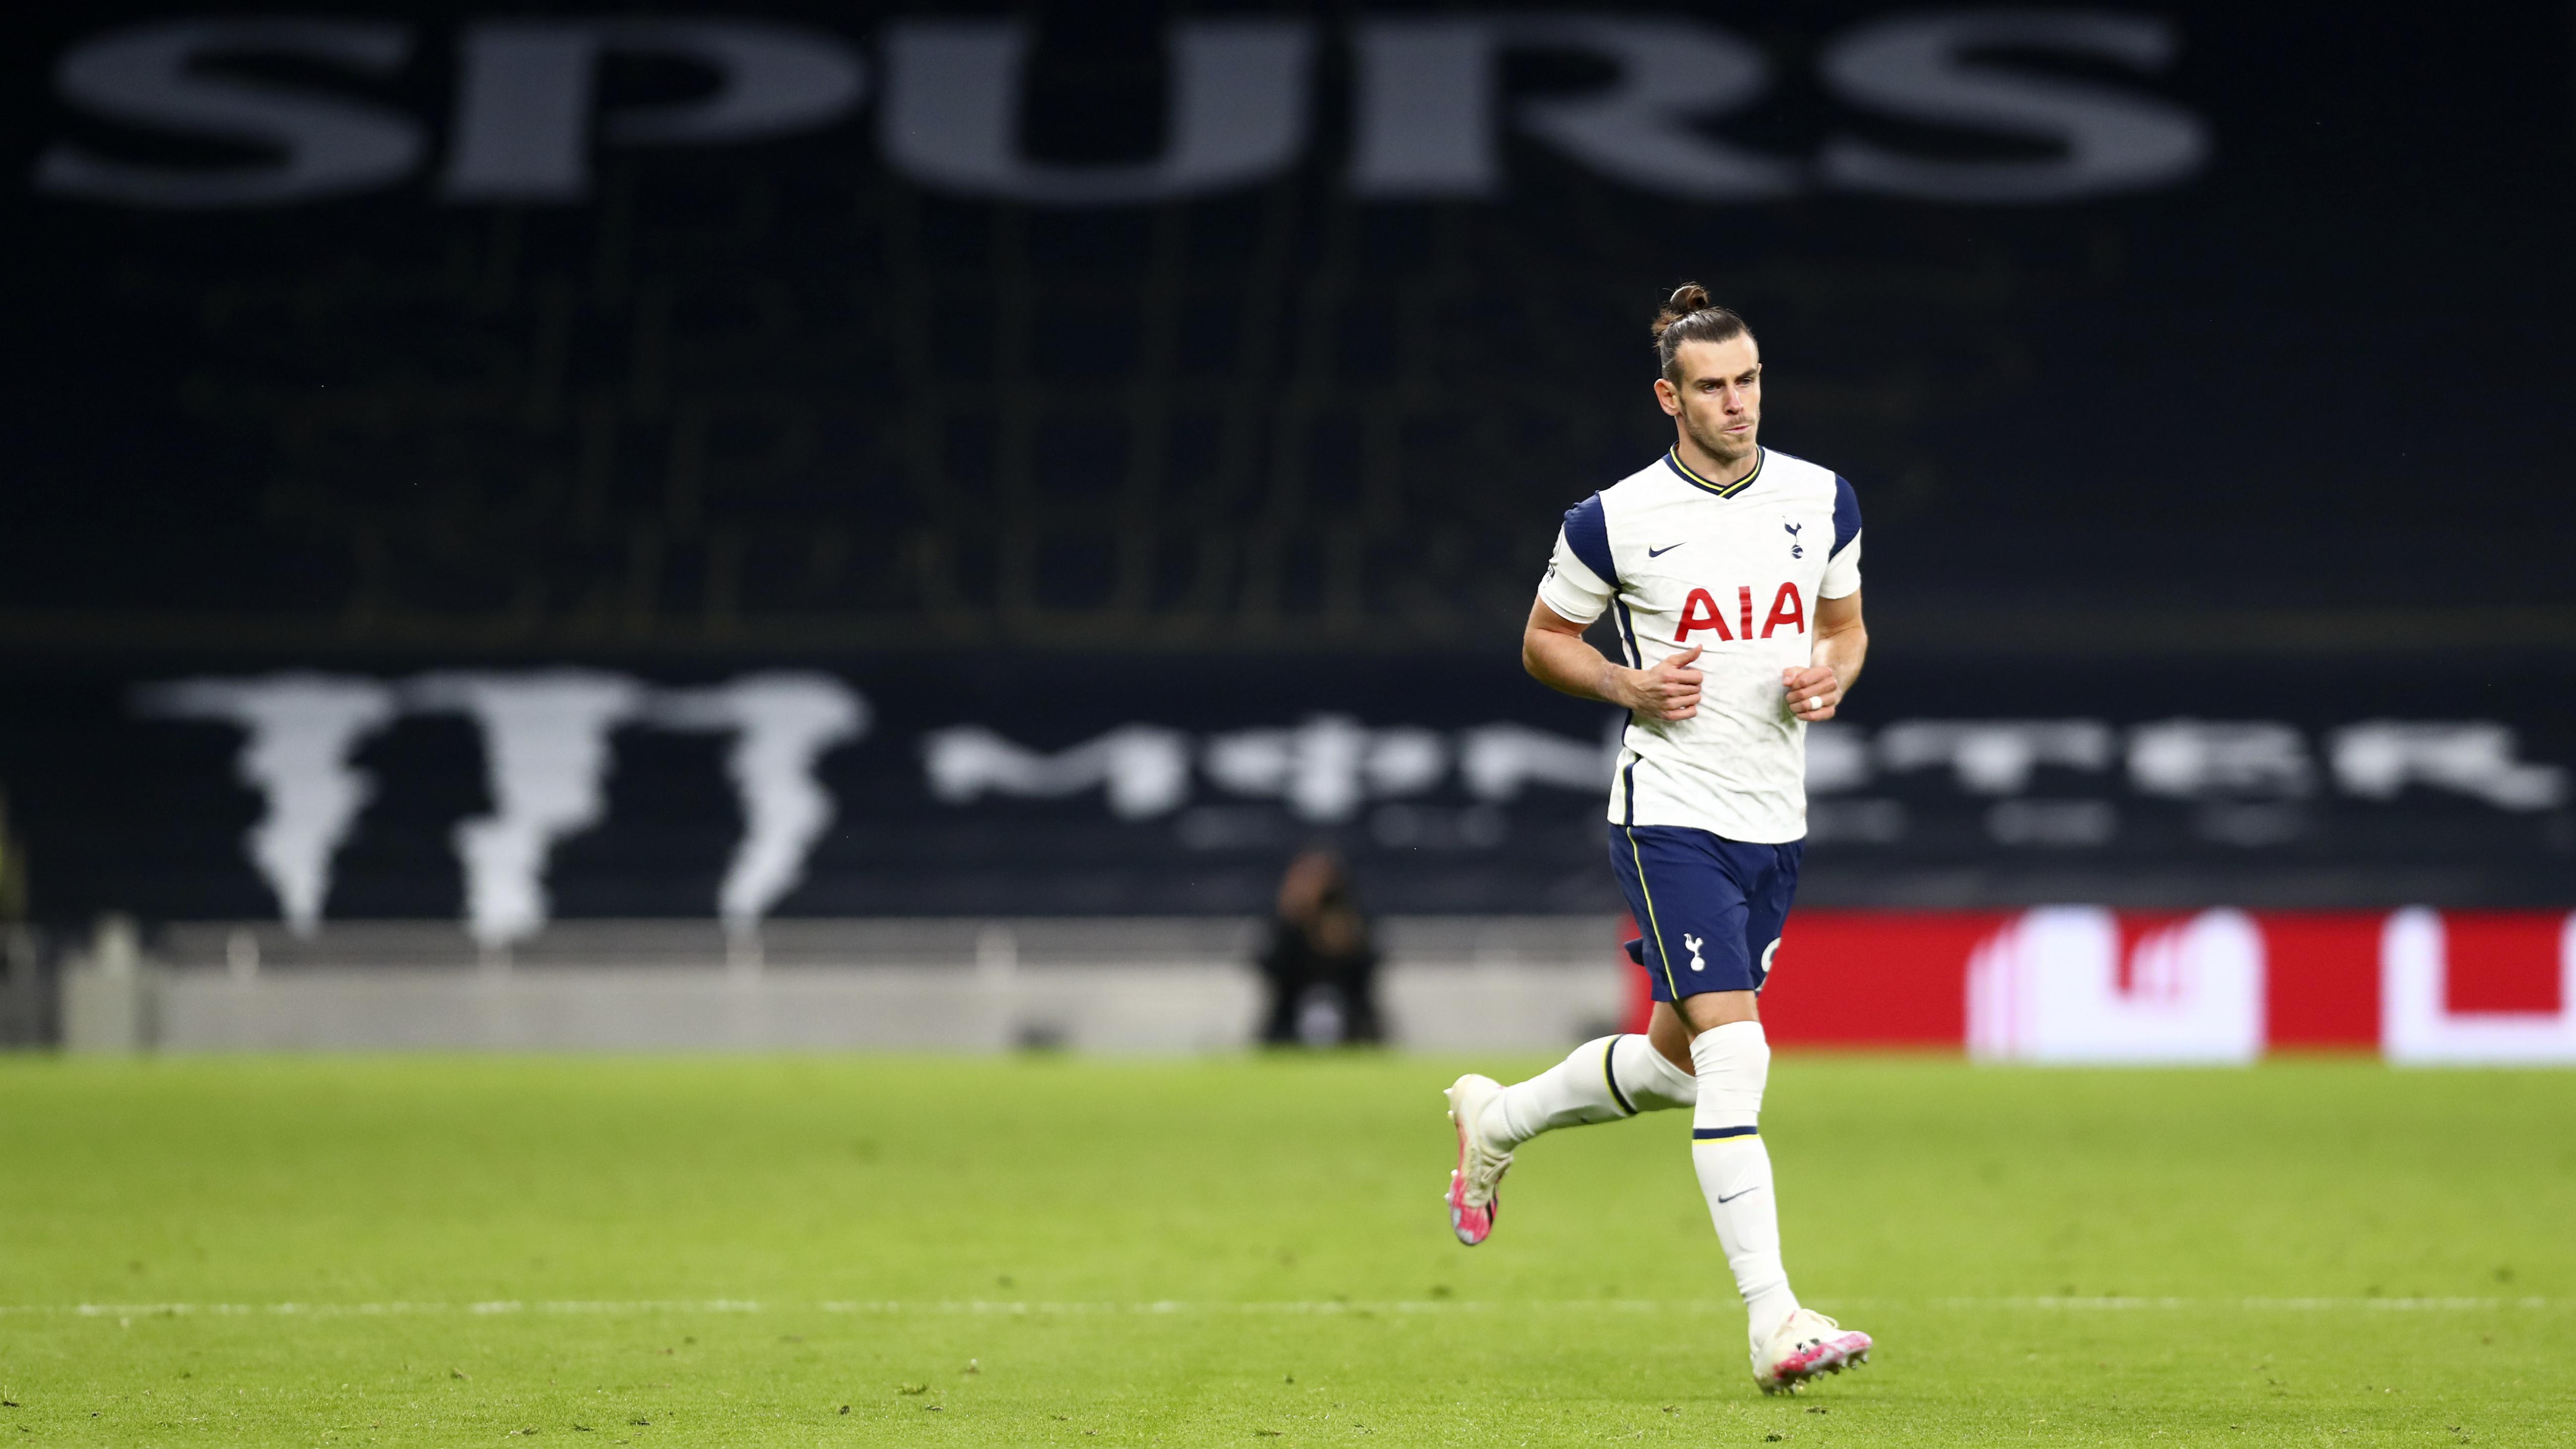 Burnley Vs Tottenham Free Live Stream 10 26 20 Watch English Premier League Online Time Usa Tv Channel Nj Com